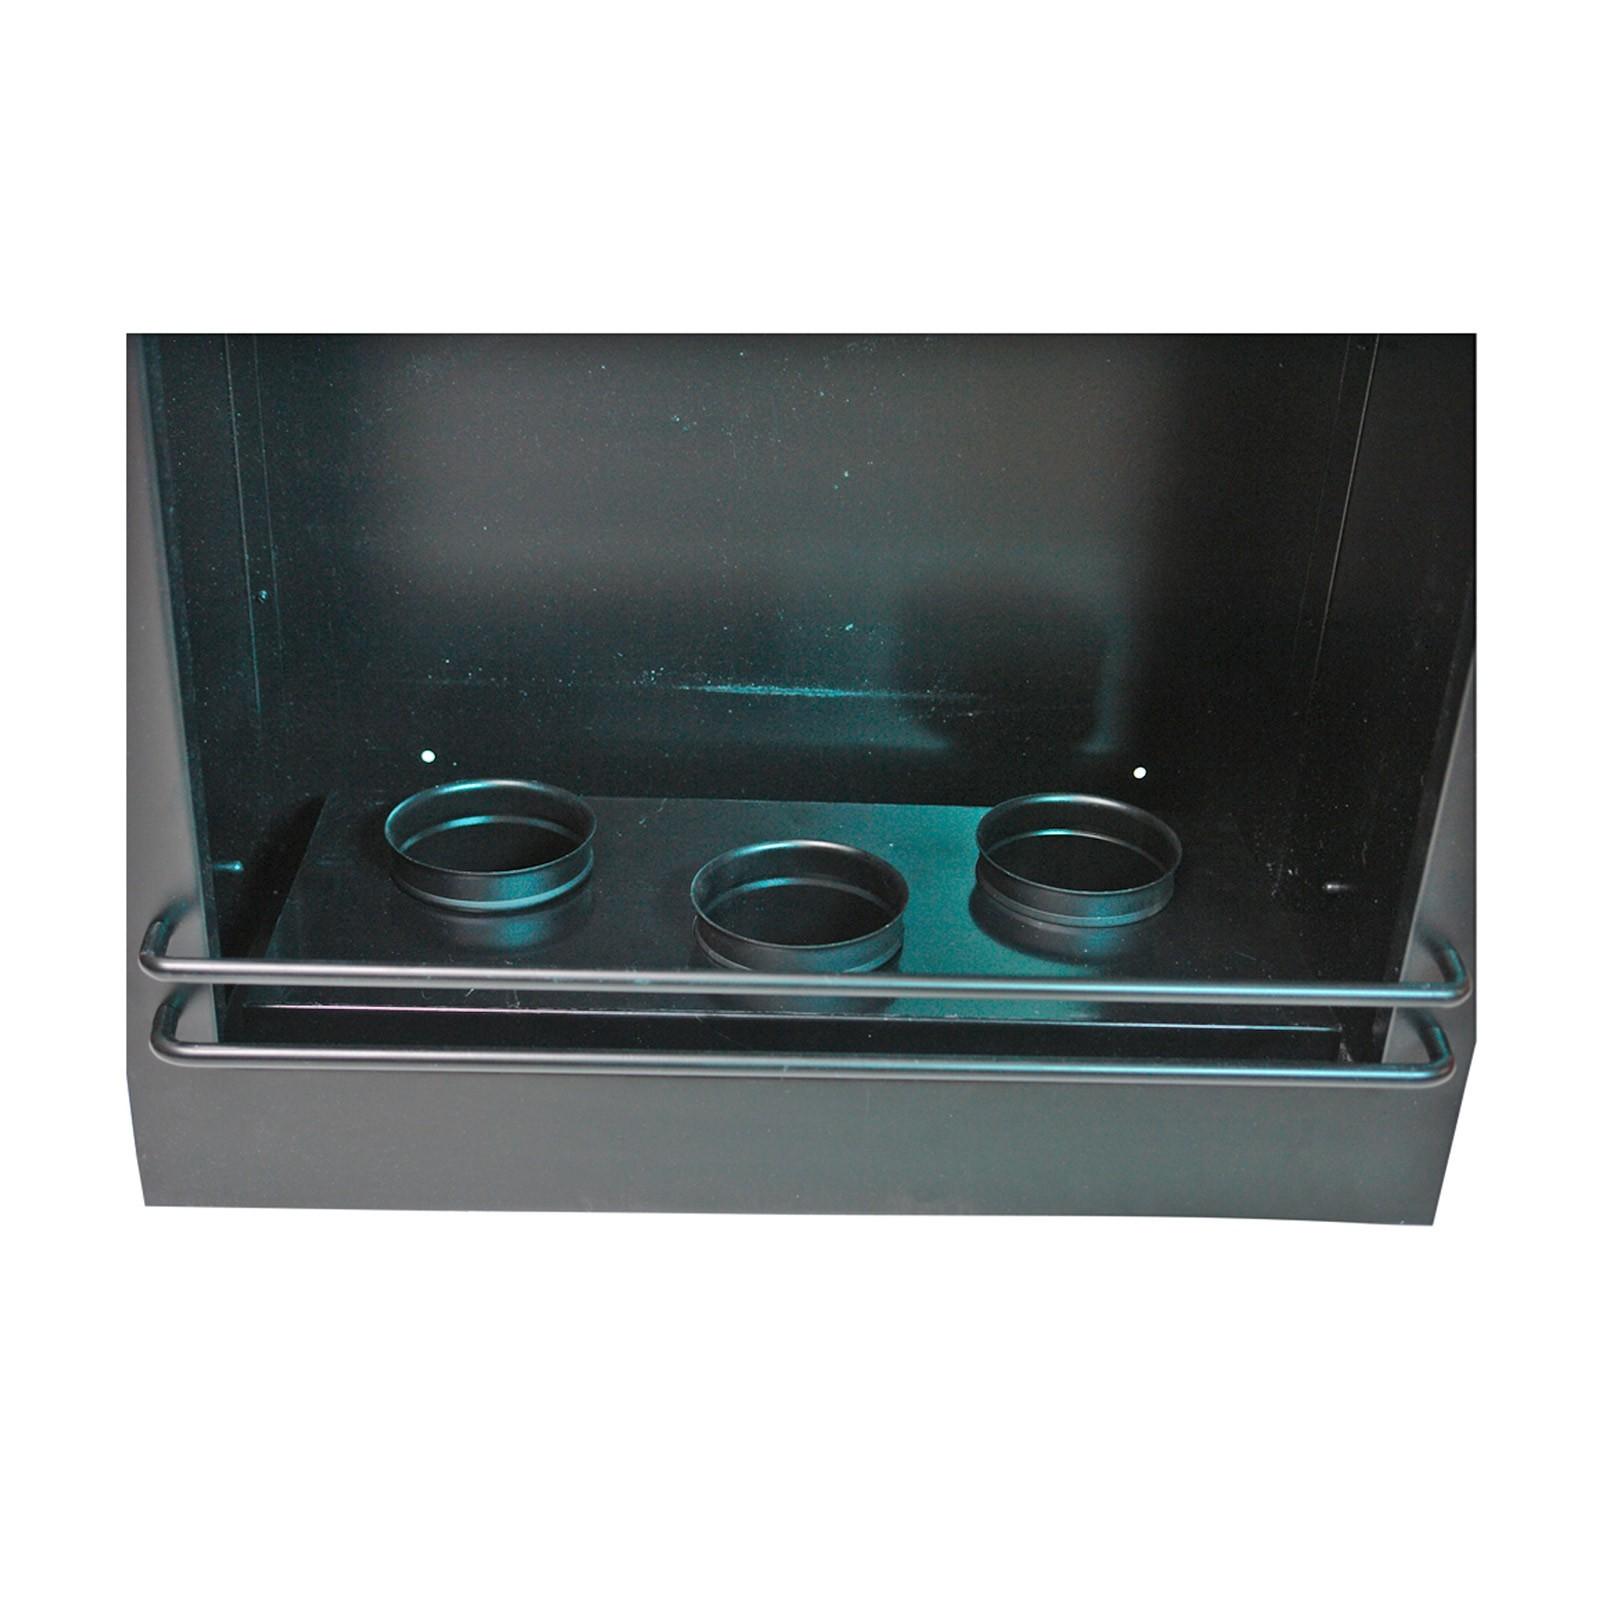 feuerstelle gelkamin ns 24 kamin biokamin 4031765609081 ebay. Black Bedroom Furniture Sets. Home Design Ideas